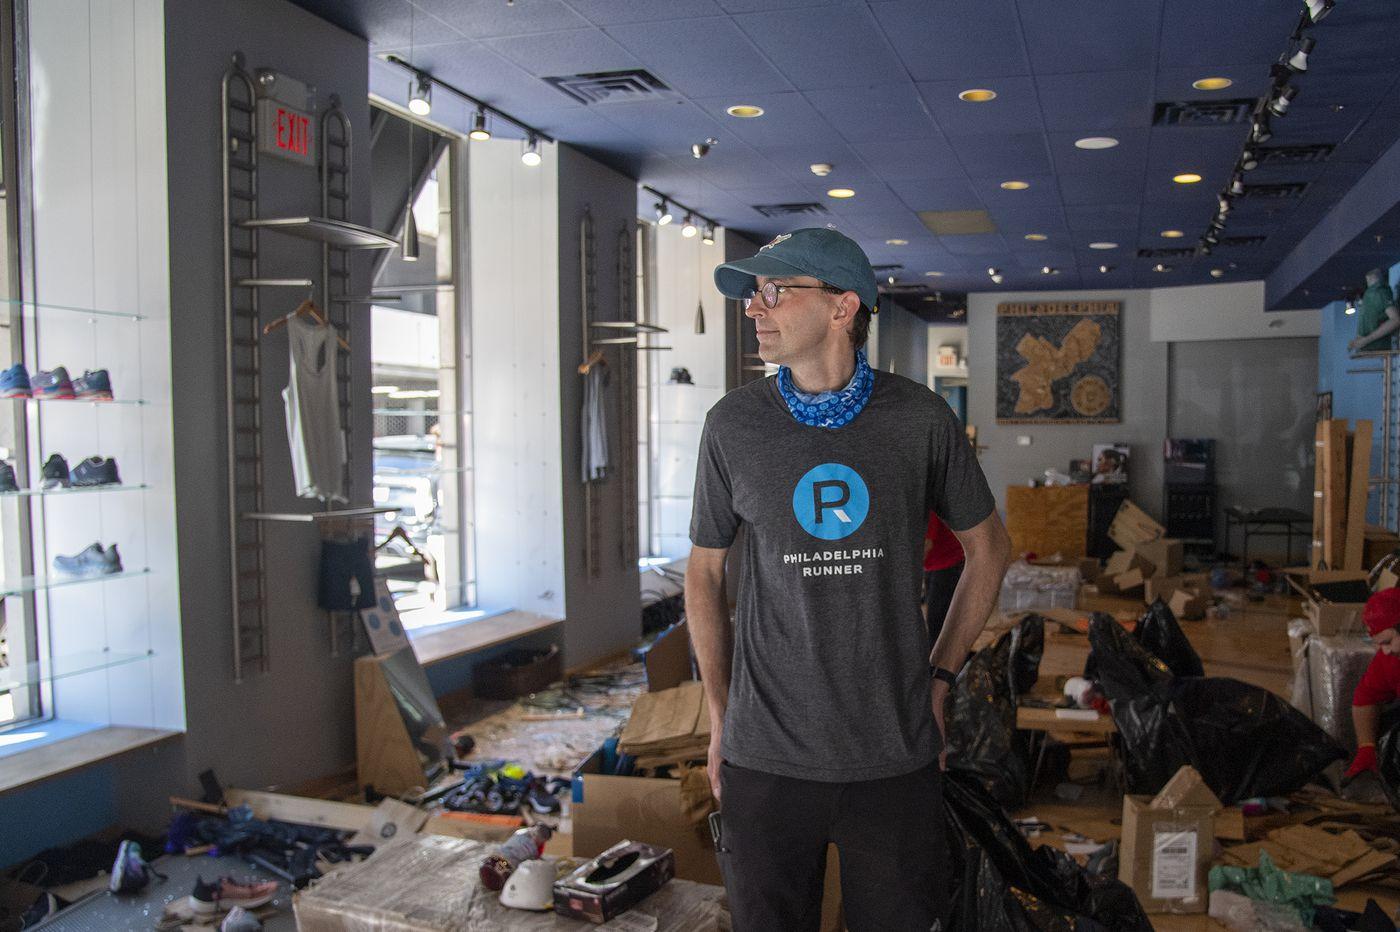 Center City retailers endure epic looting on top of coronavirus closures